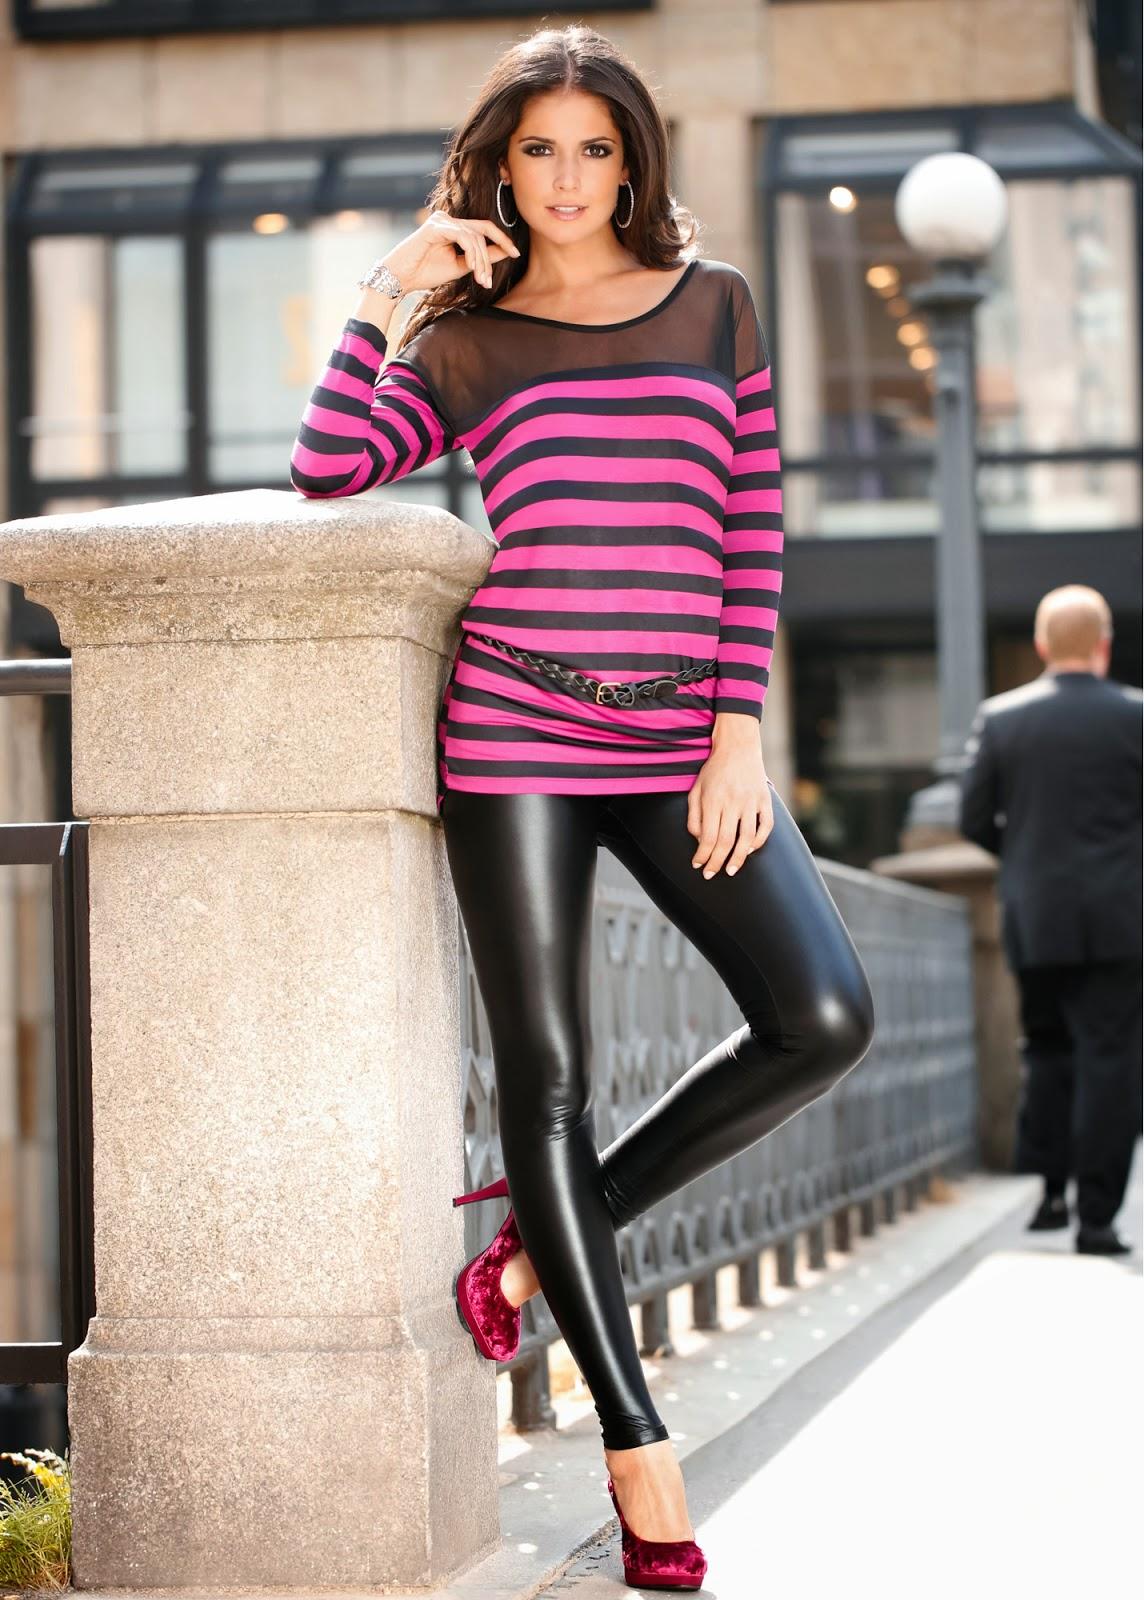 Lovely Ladies In Leather Carla Ossa In Wet Look Leggings-5583